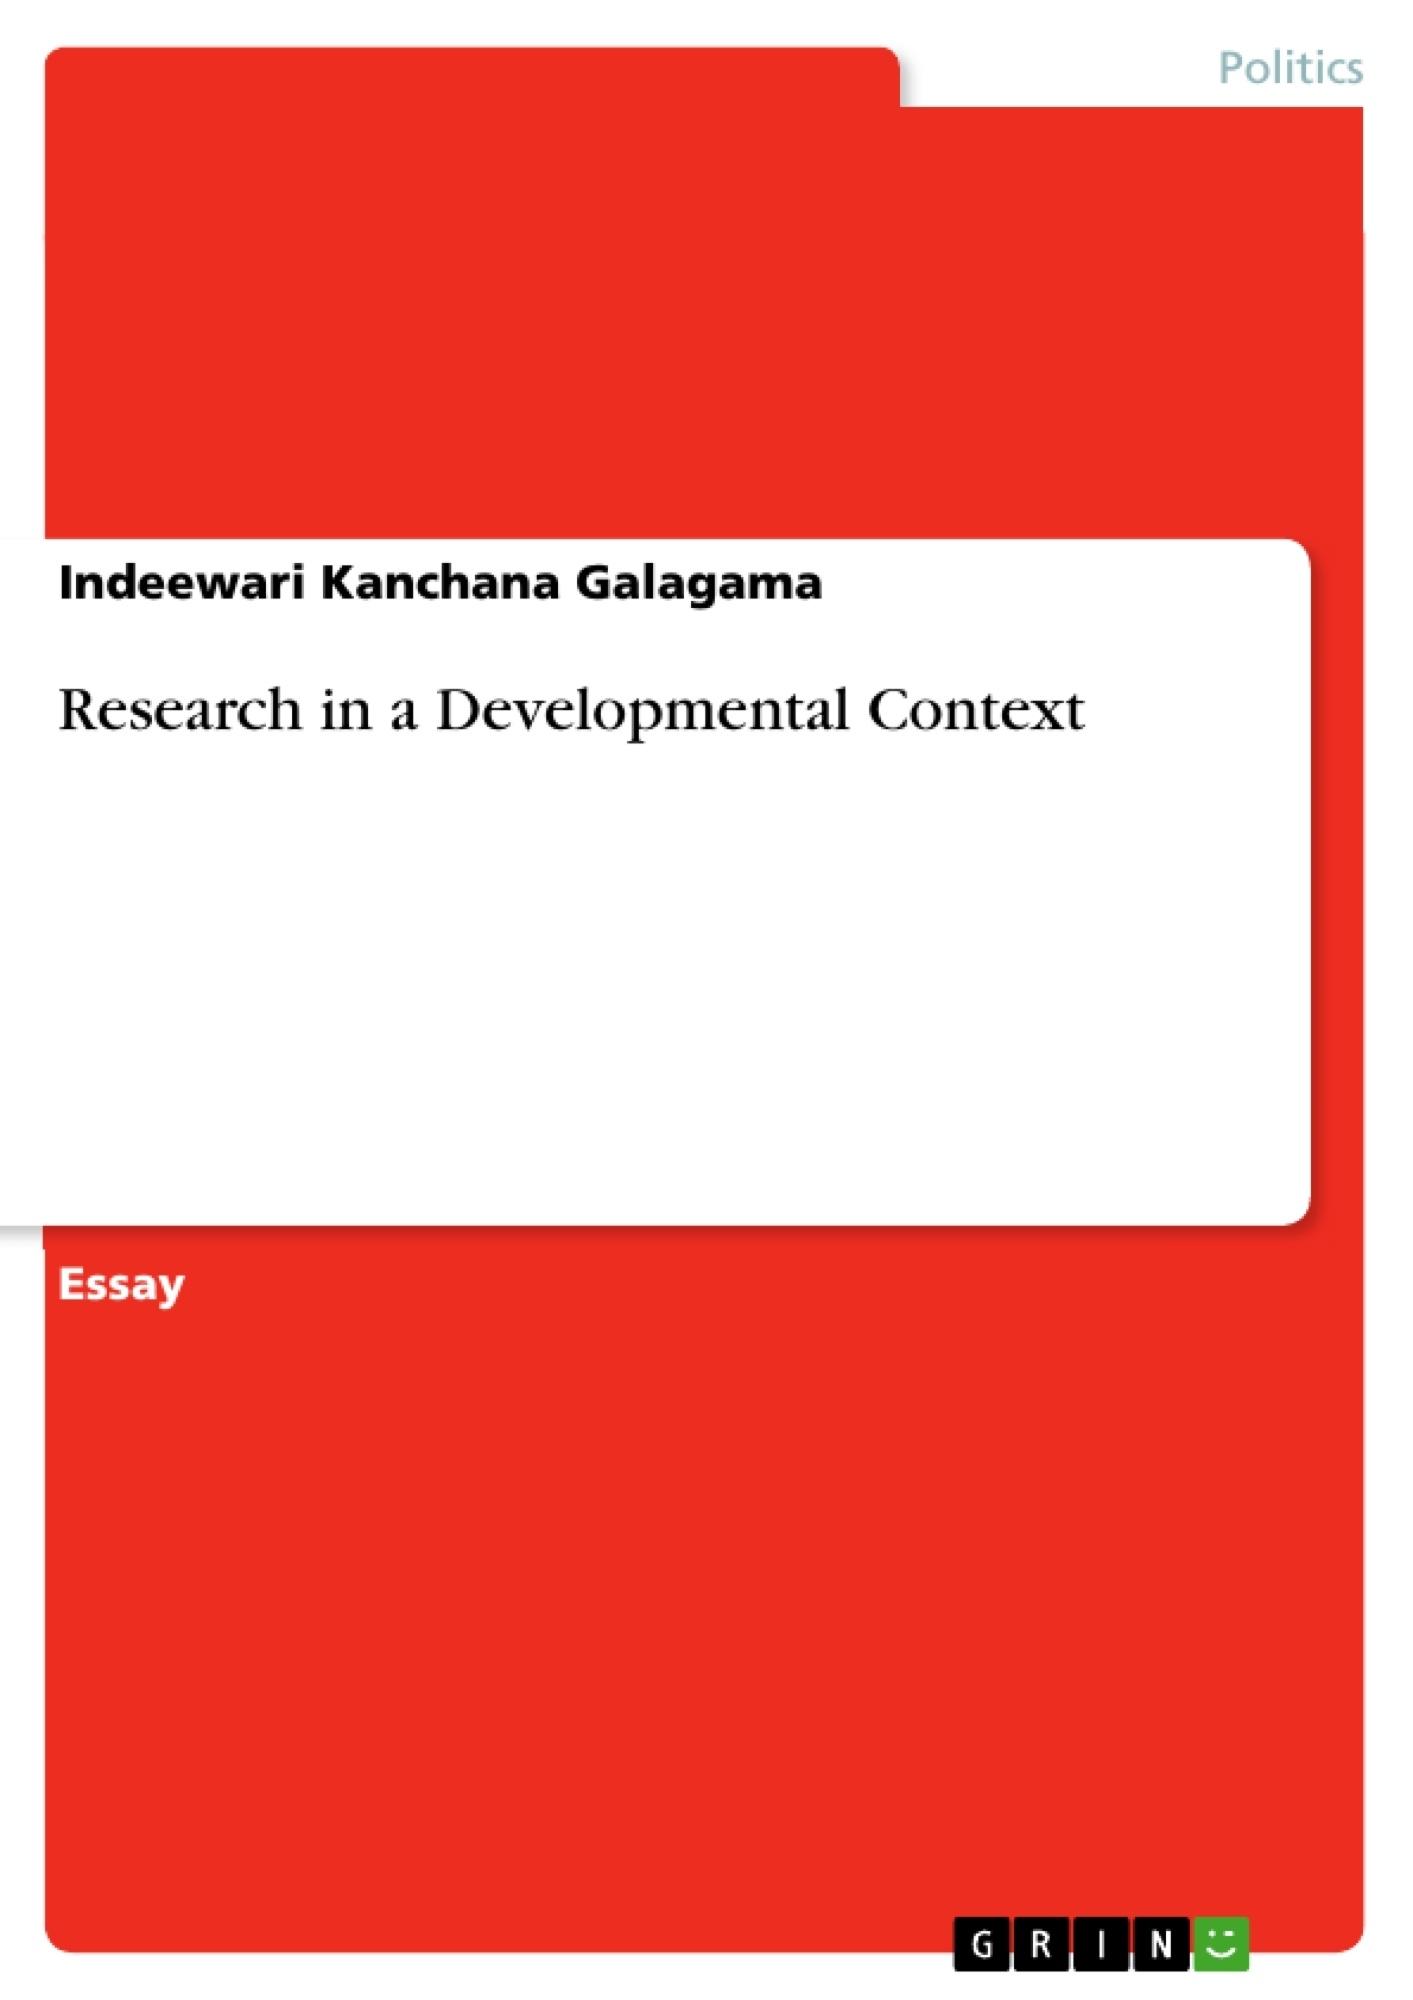 Title: Research in a Developmental Context